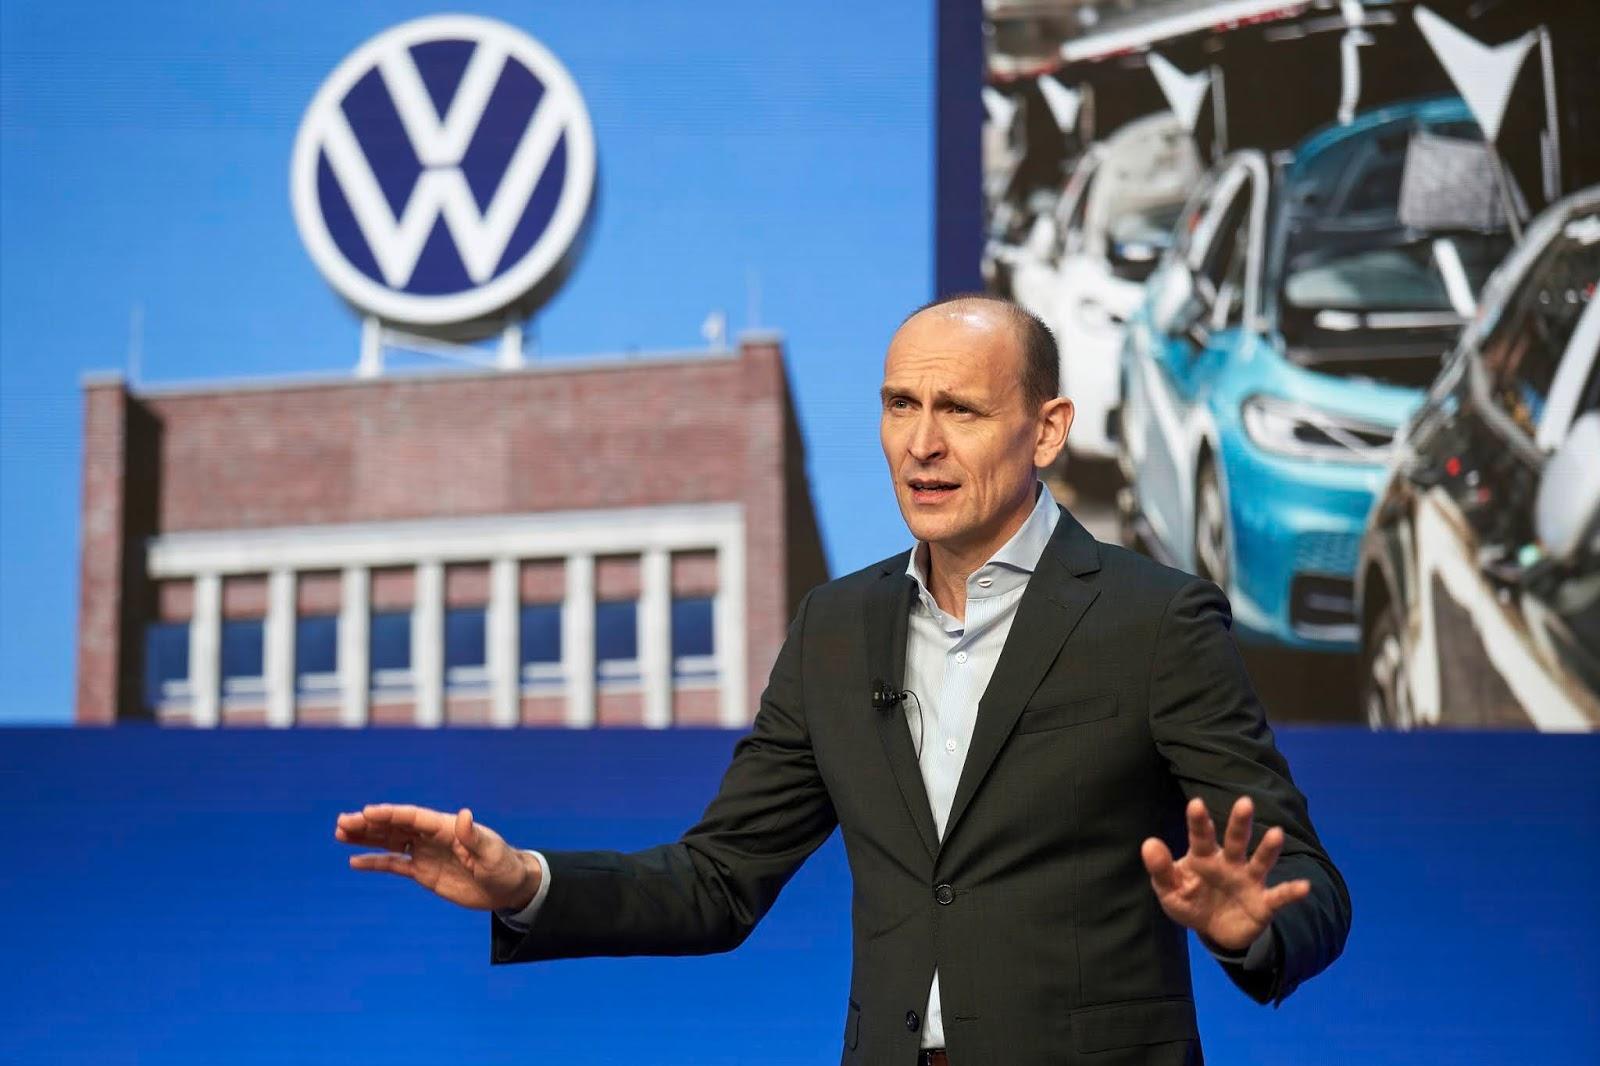 VOLKSWAGEN2B 2BRALF2BBRANDSTAETTER252C2BCEO Volkswagen : Κυρίαρχη στην ηλεκτροκίνηση το 2021 Electric cars, electric vehicles, Hybrid, plug-in hybrid, Volkswagen, zblog, ειδήσεις, ηλεκτρικά, ηλεκτροκινηση, υβριδικό